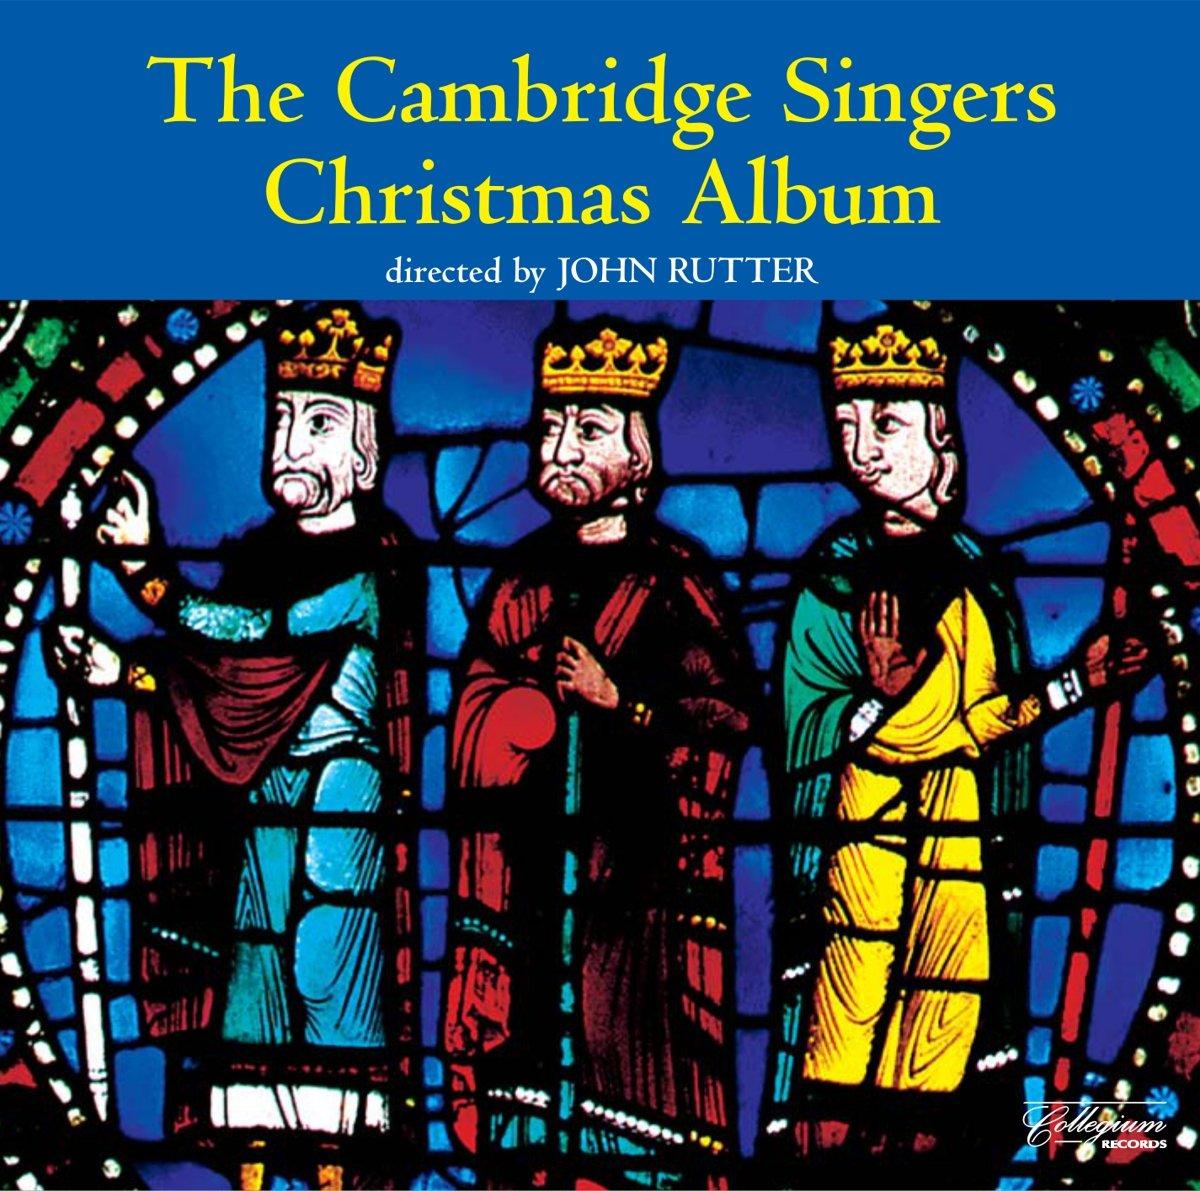 JOHN RUTTER - Cambridge Singers Christmas Album - Amazon.com Music